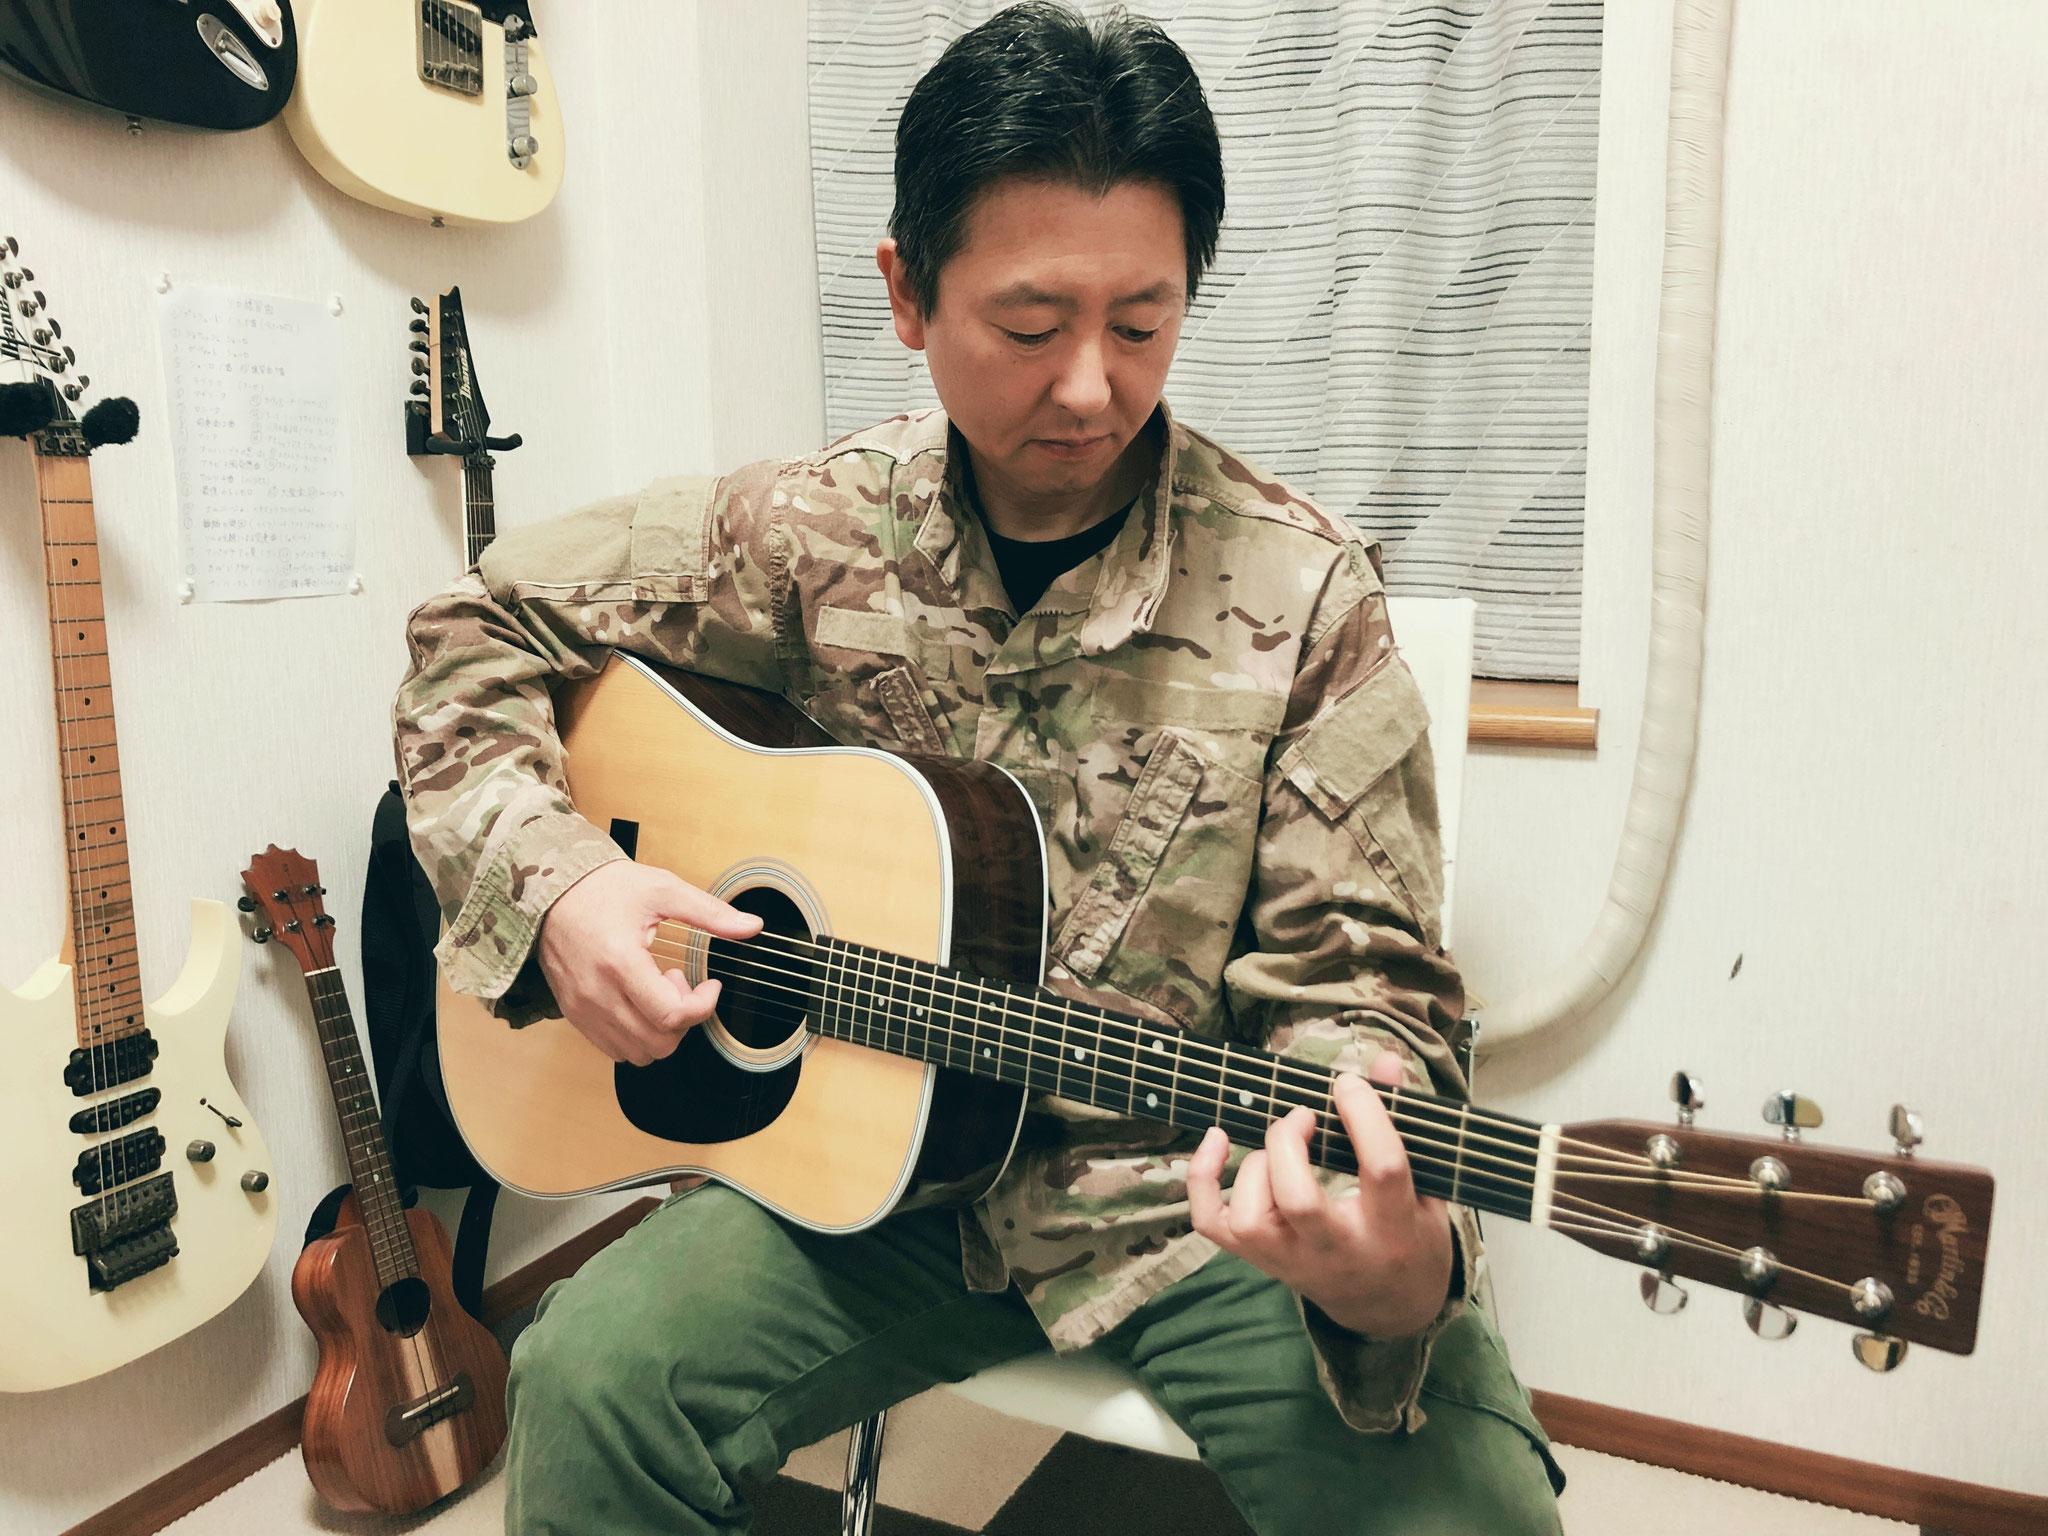 Tritoneアコースティックギター教室 生徒の声 一ノ瀬さん